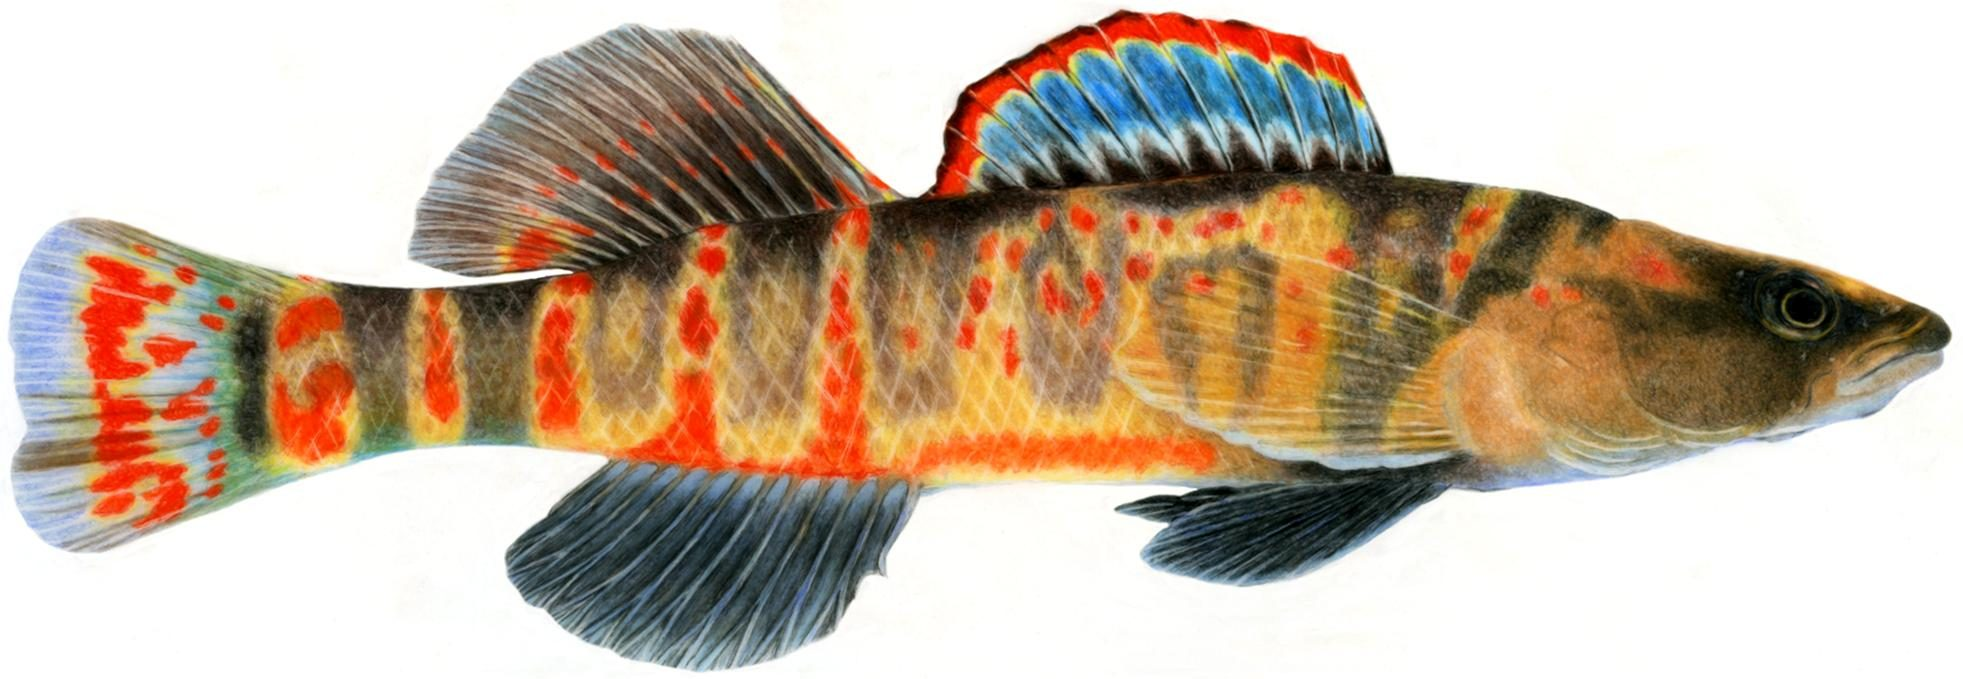 Free photograph; cumberland, arrow, darter, illustration, fish